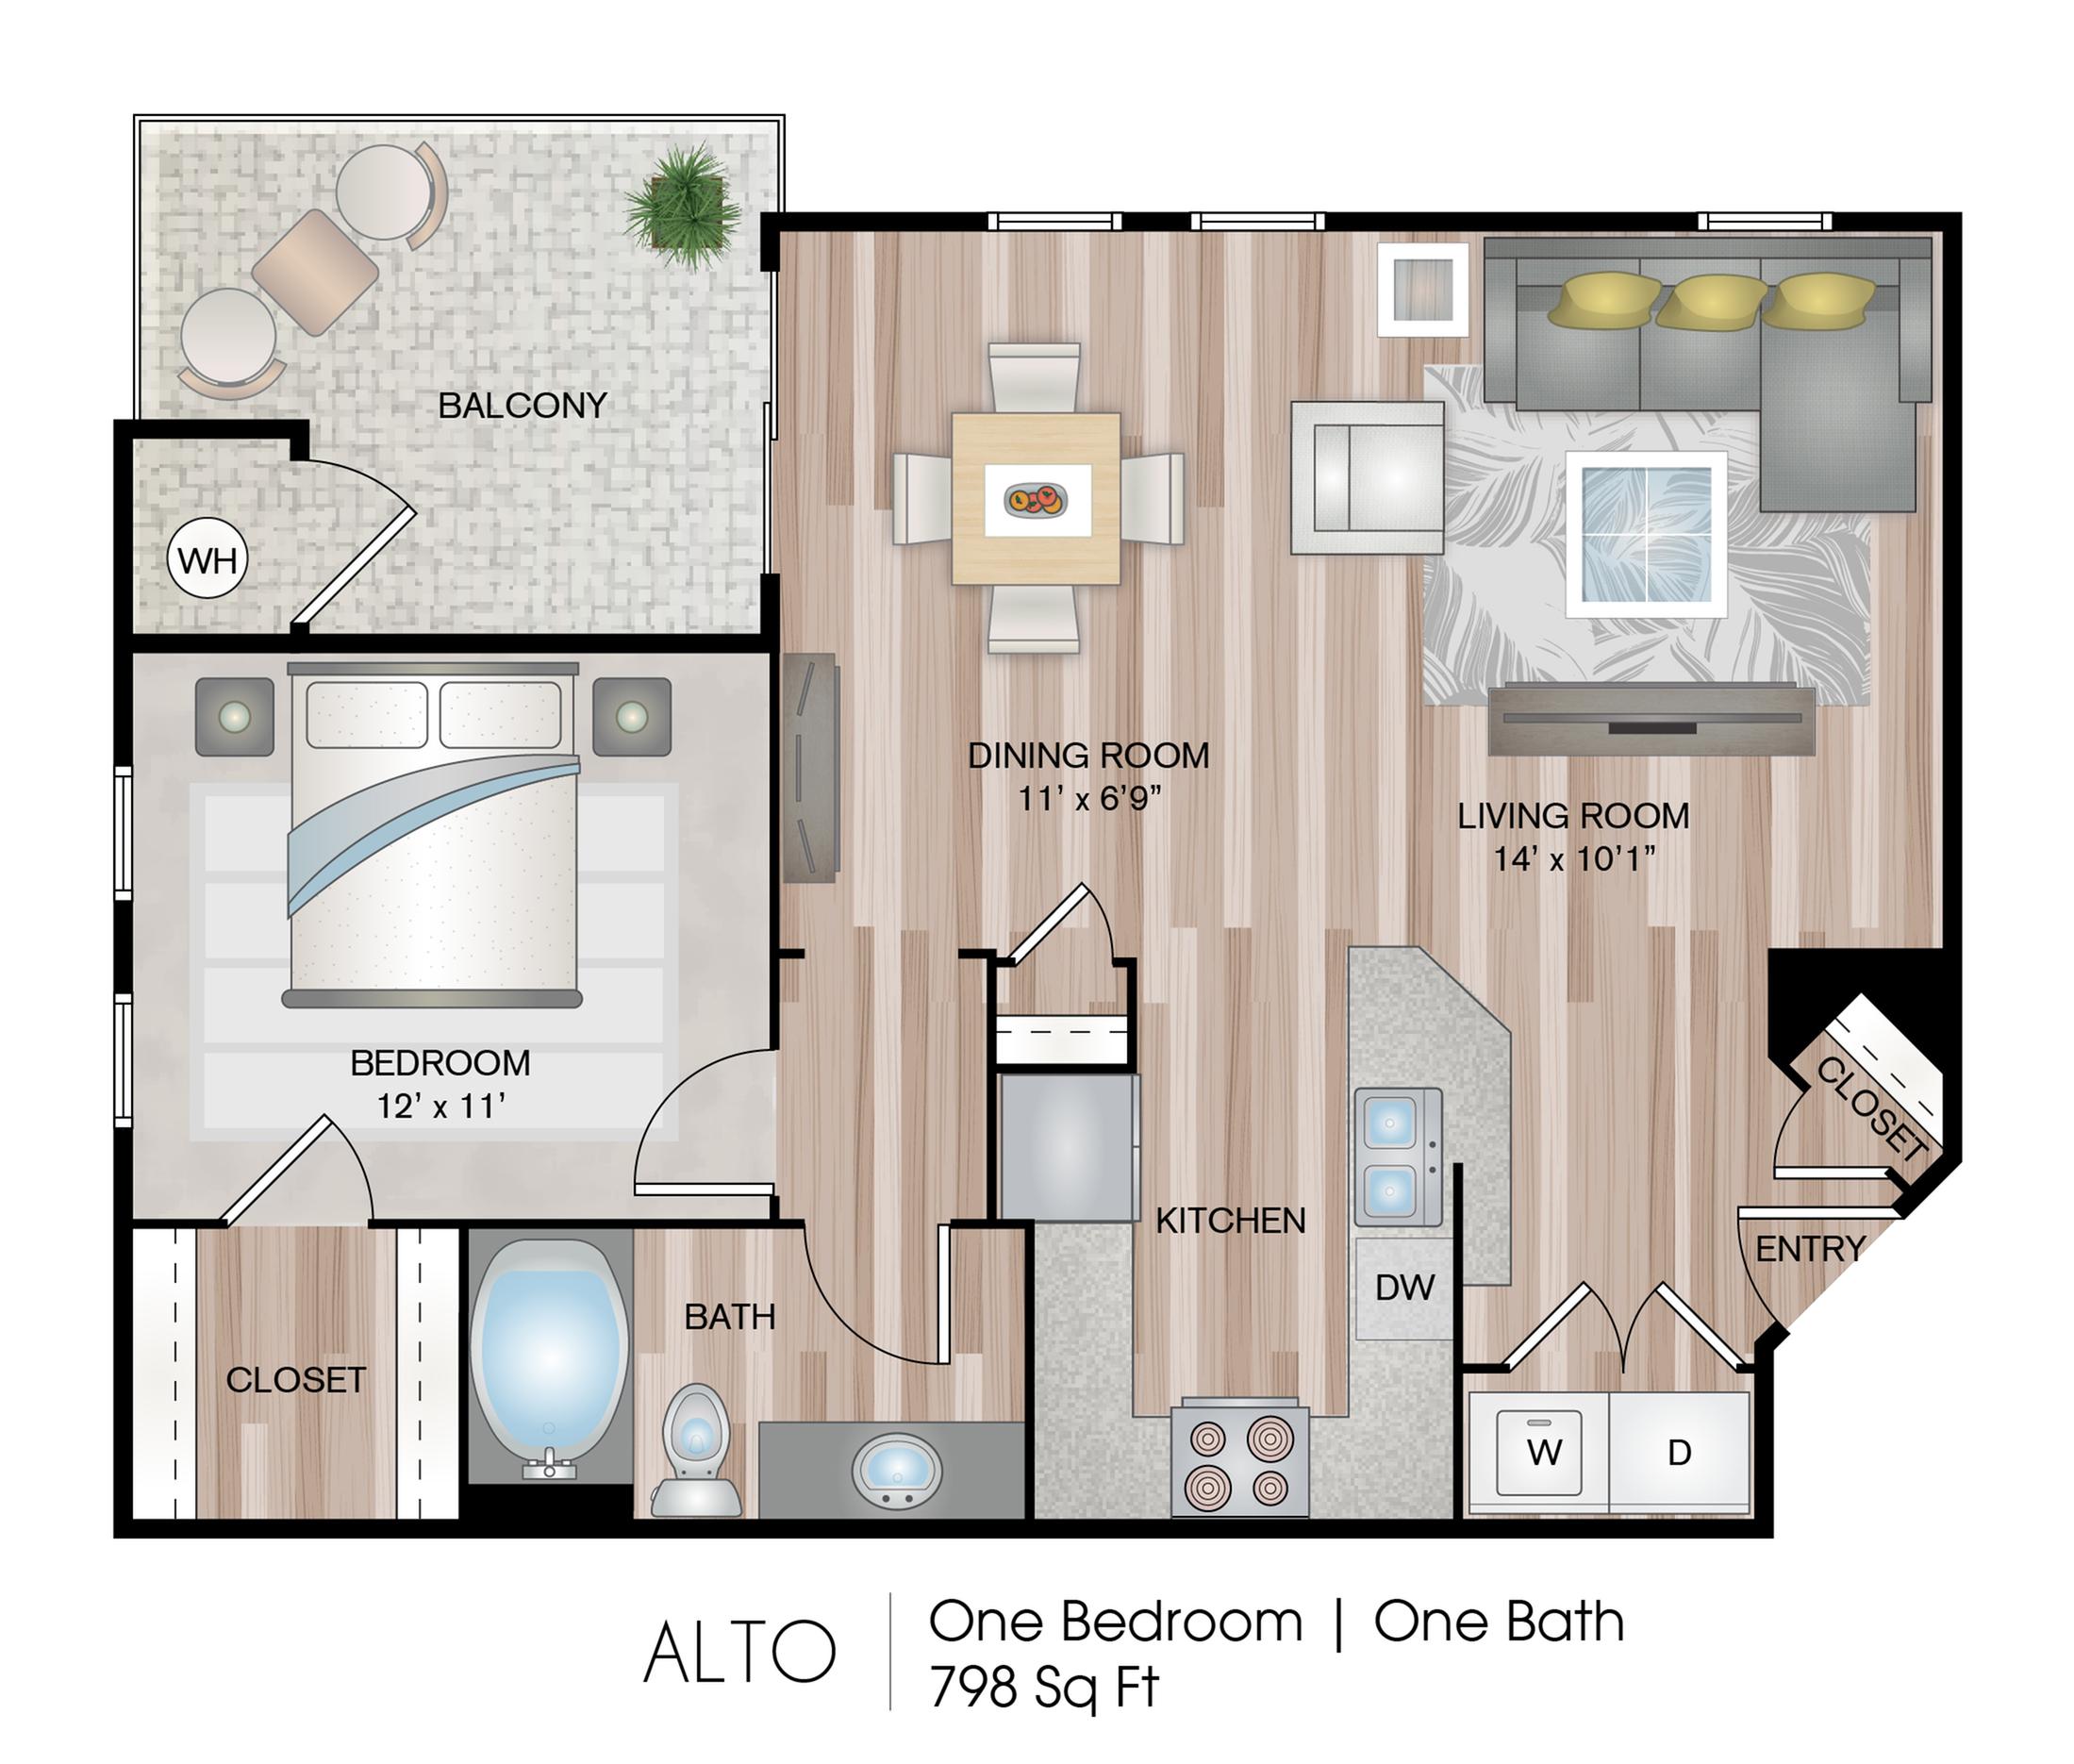 Alto 1 Bed Apartment Serenade At Riverpark Luxury Apartments In Oxnard Ca Serenade At River Park